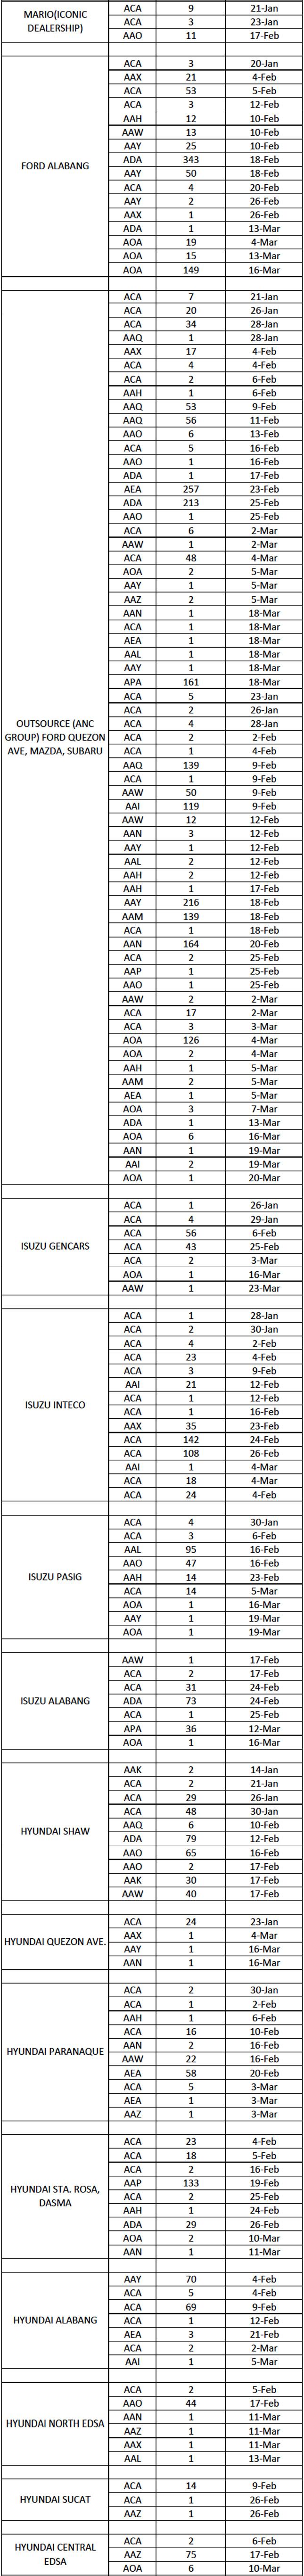 LTO plate distribution list